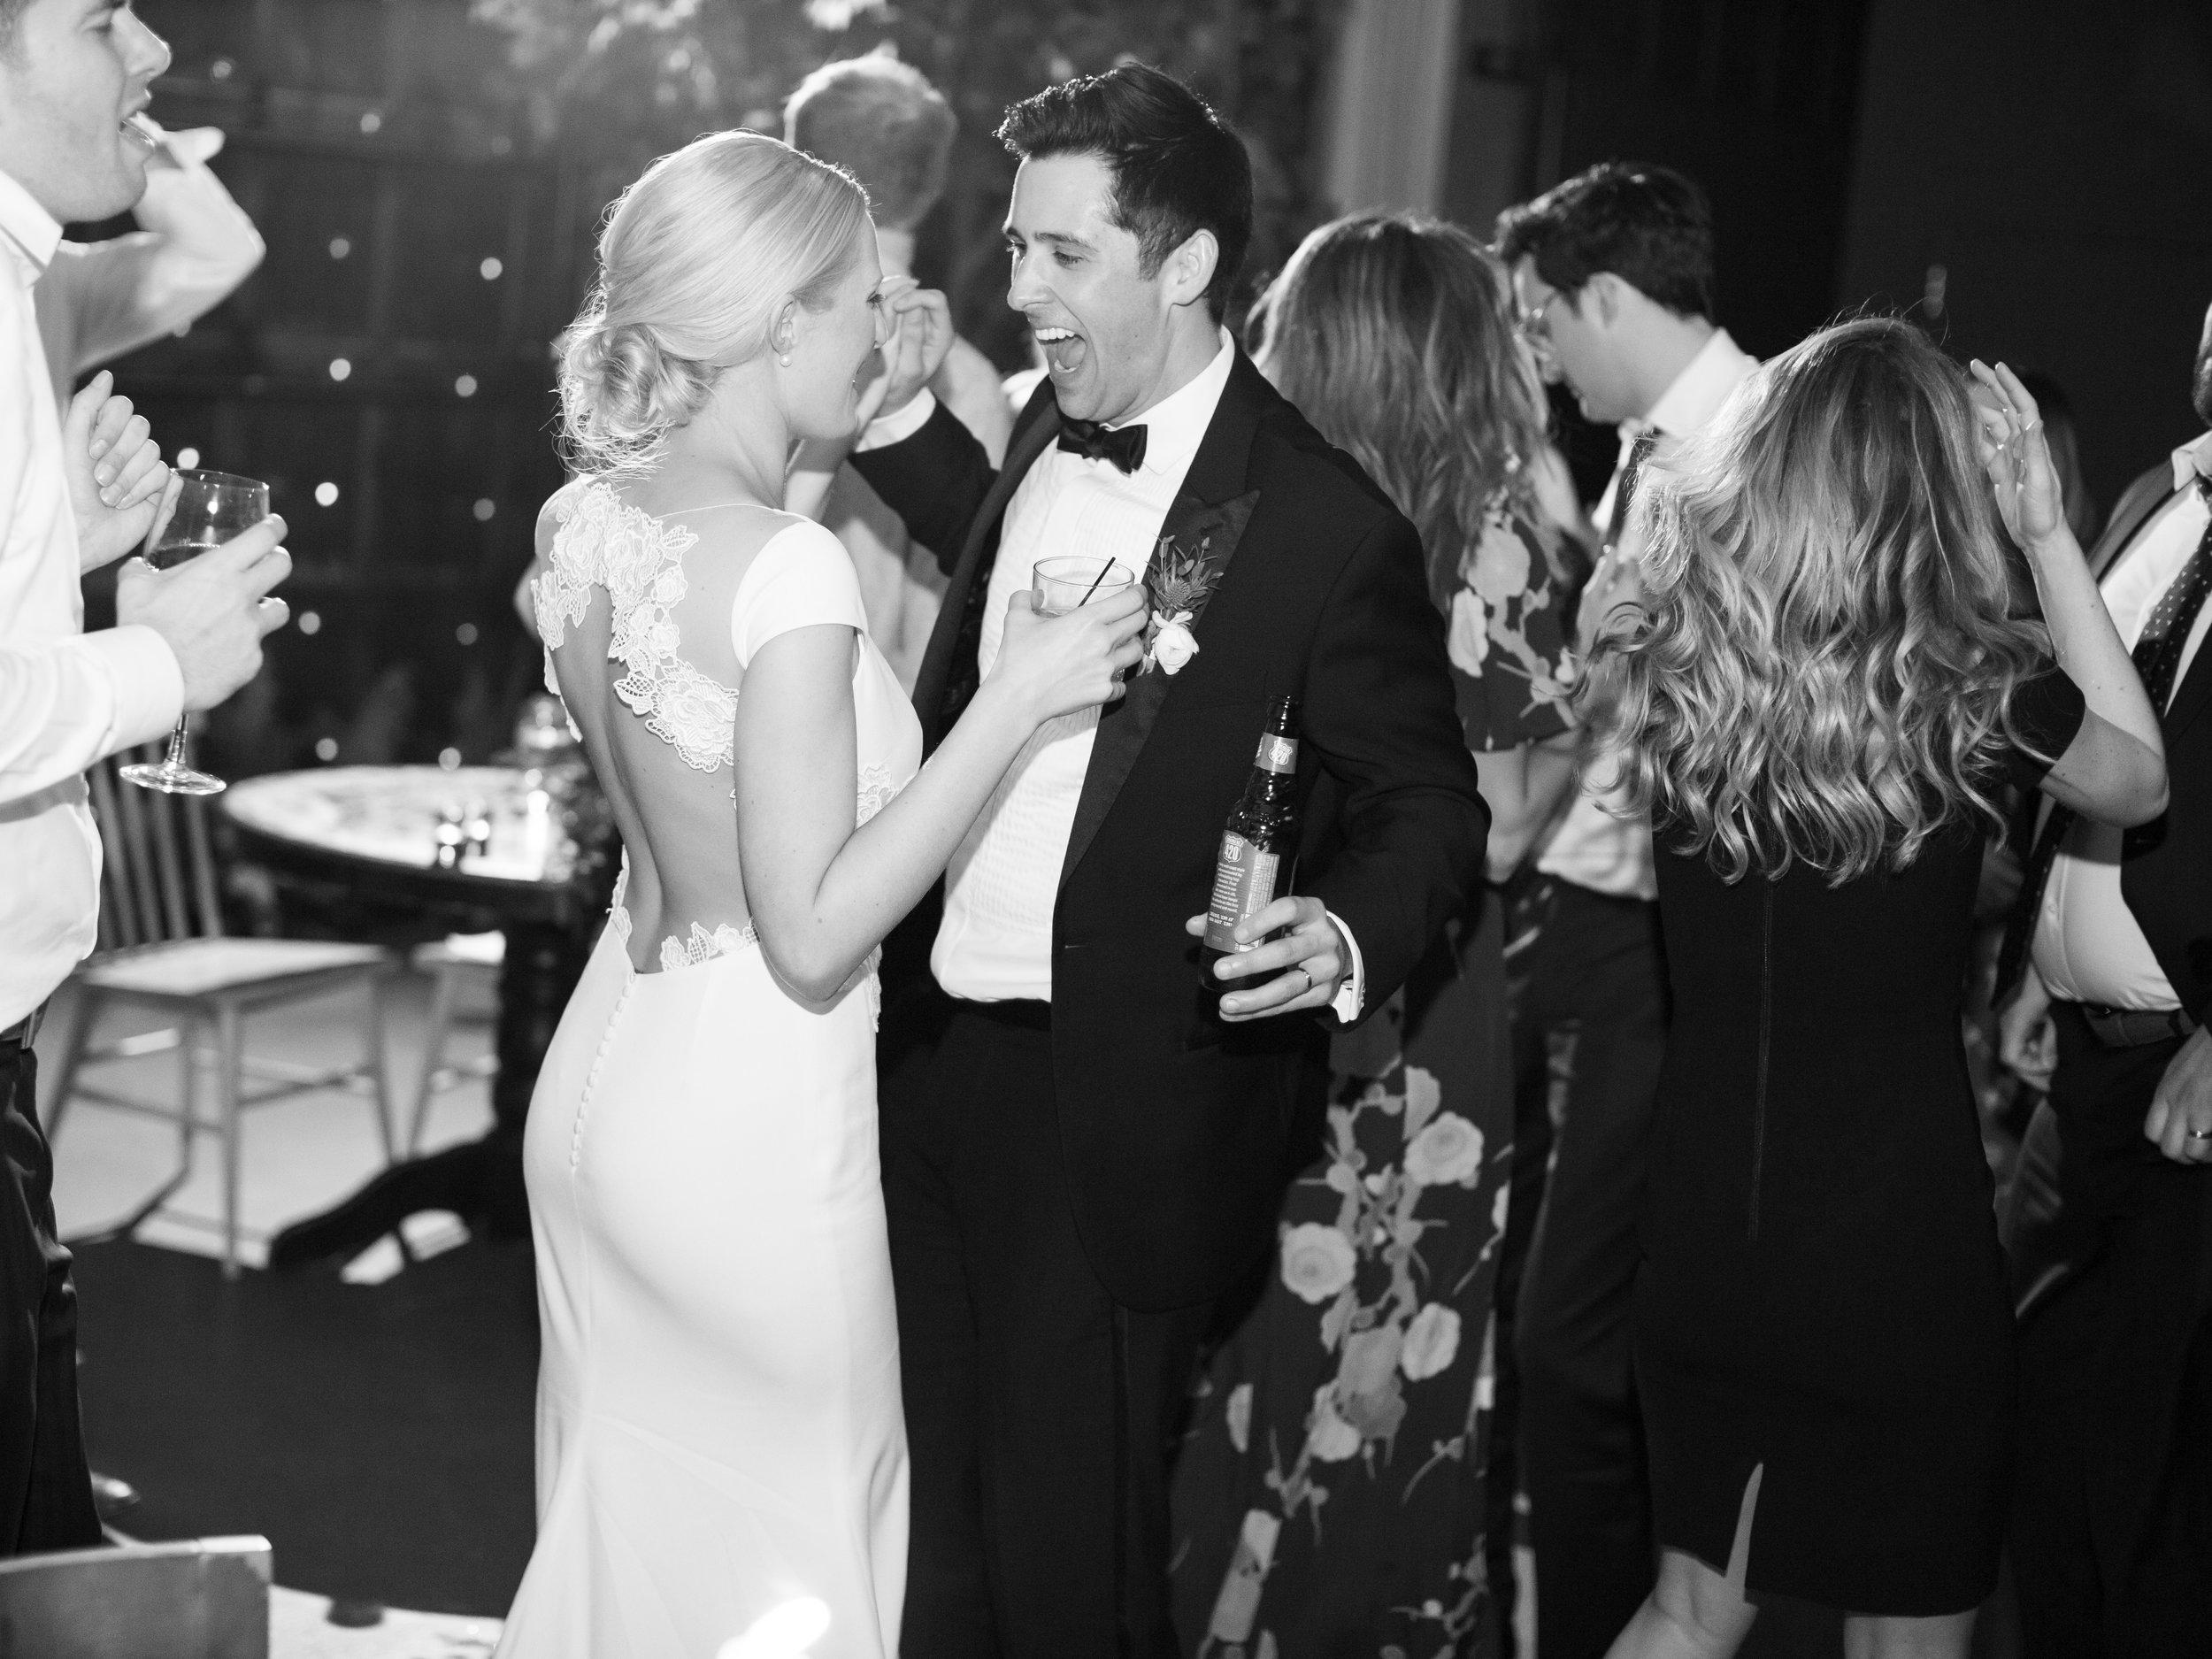 ivory_and_beau_couple_kate_and_dustin_wedding_flowers_savannah_florist_spring_wedding_georgia_8.jpg